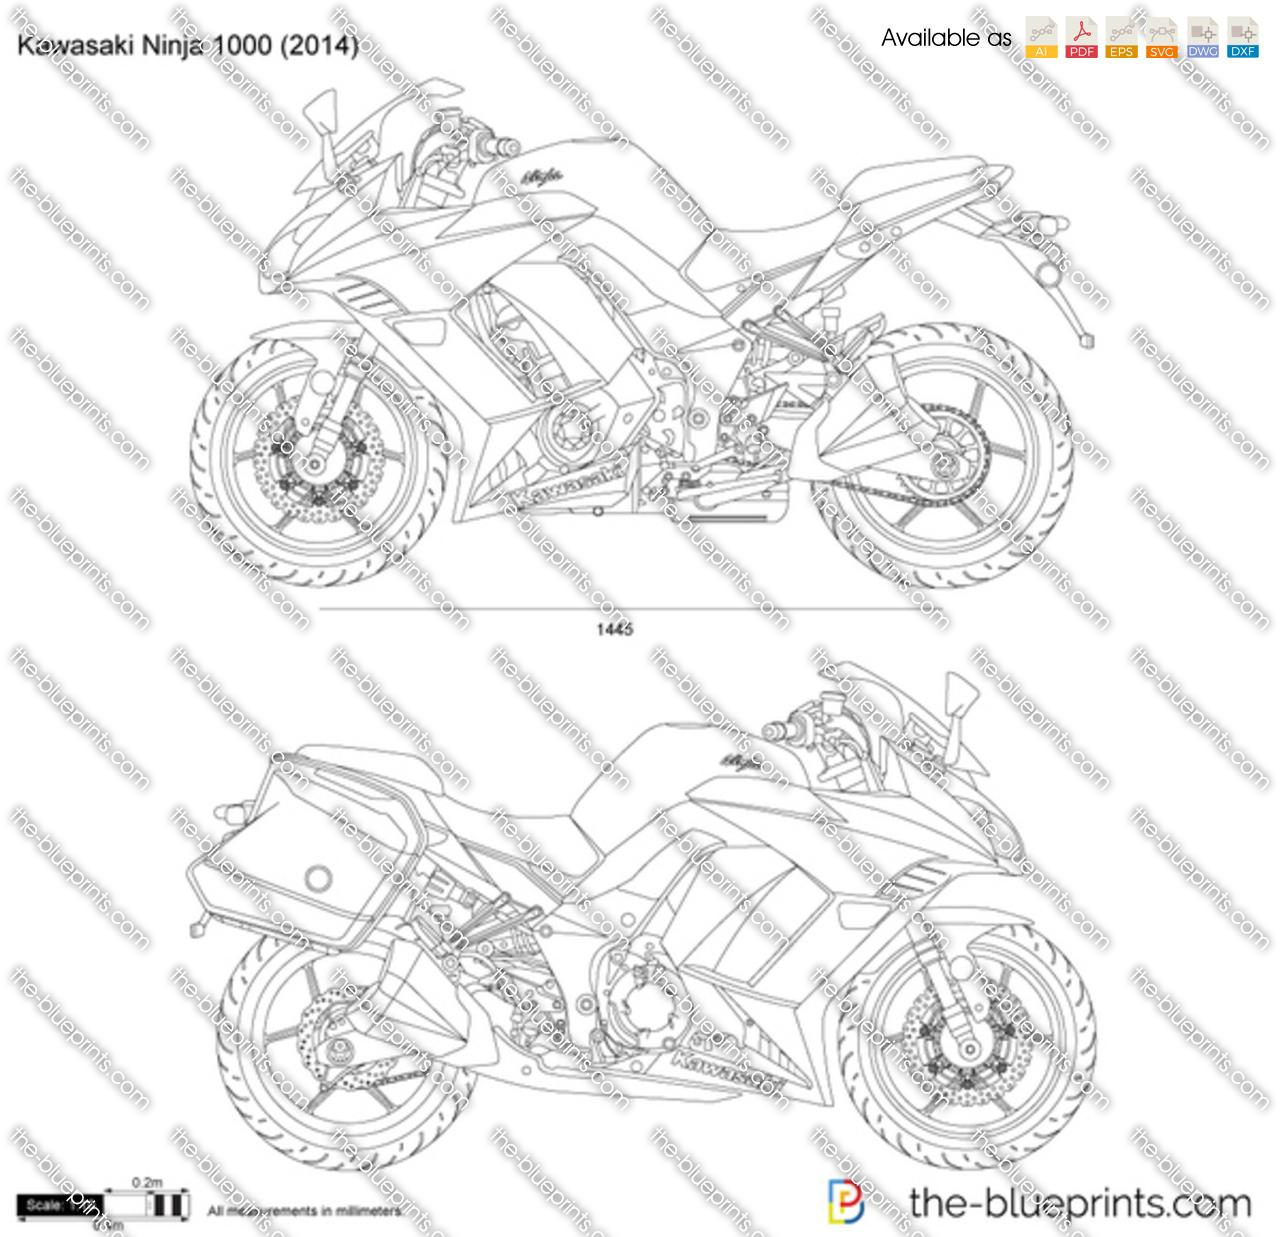 Kawasaki Ninja 1000 vector drawing